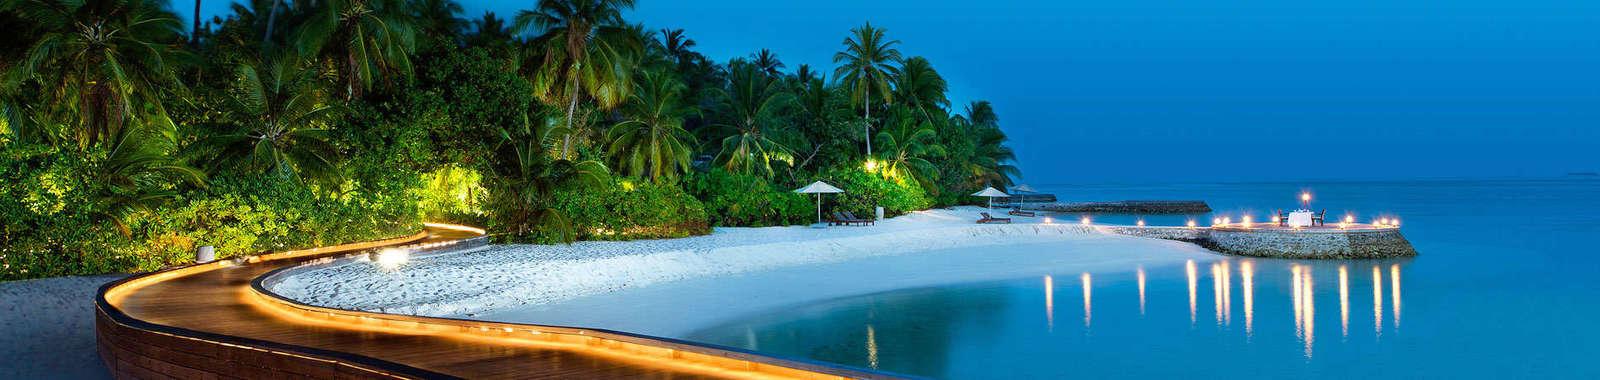 Maldives-Homepage-Background-W-Retreat